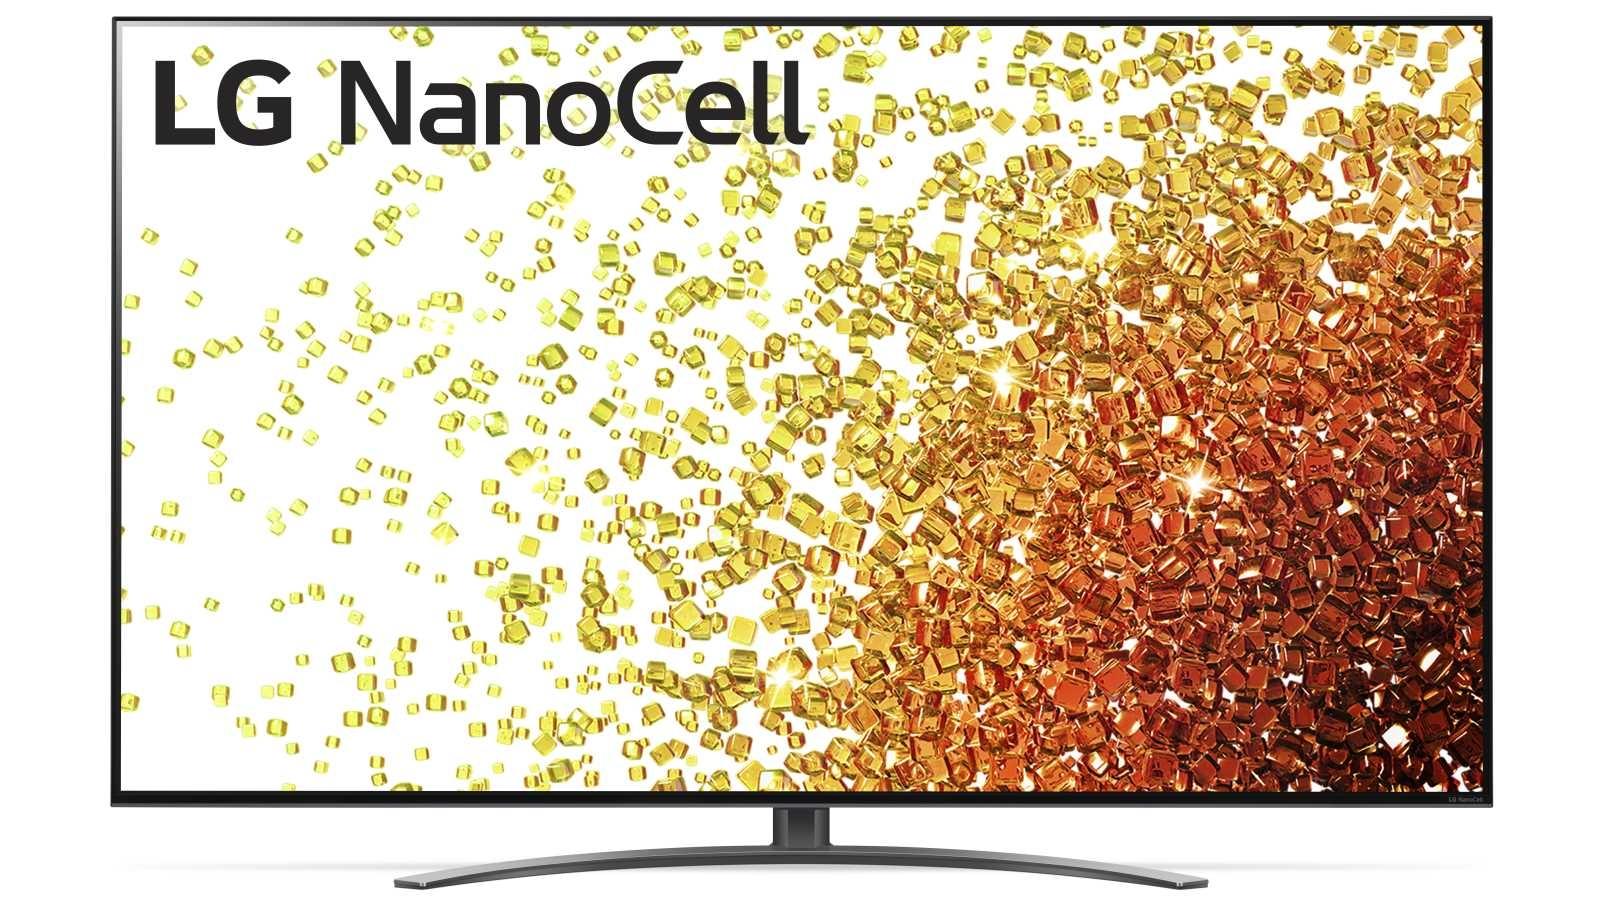 Image of LG 86-inch Nano91 4K UHD NanoCell LED LCD Ai ThinQ Smart TV